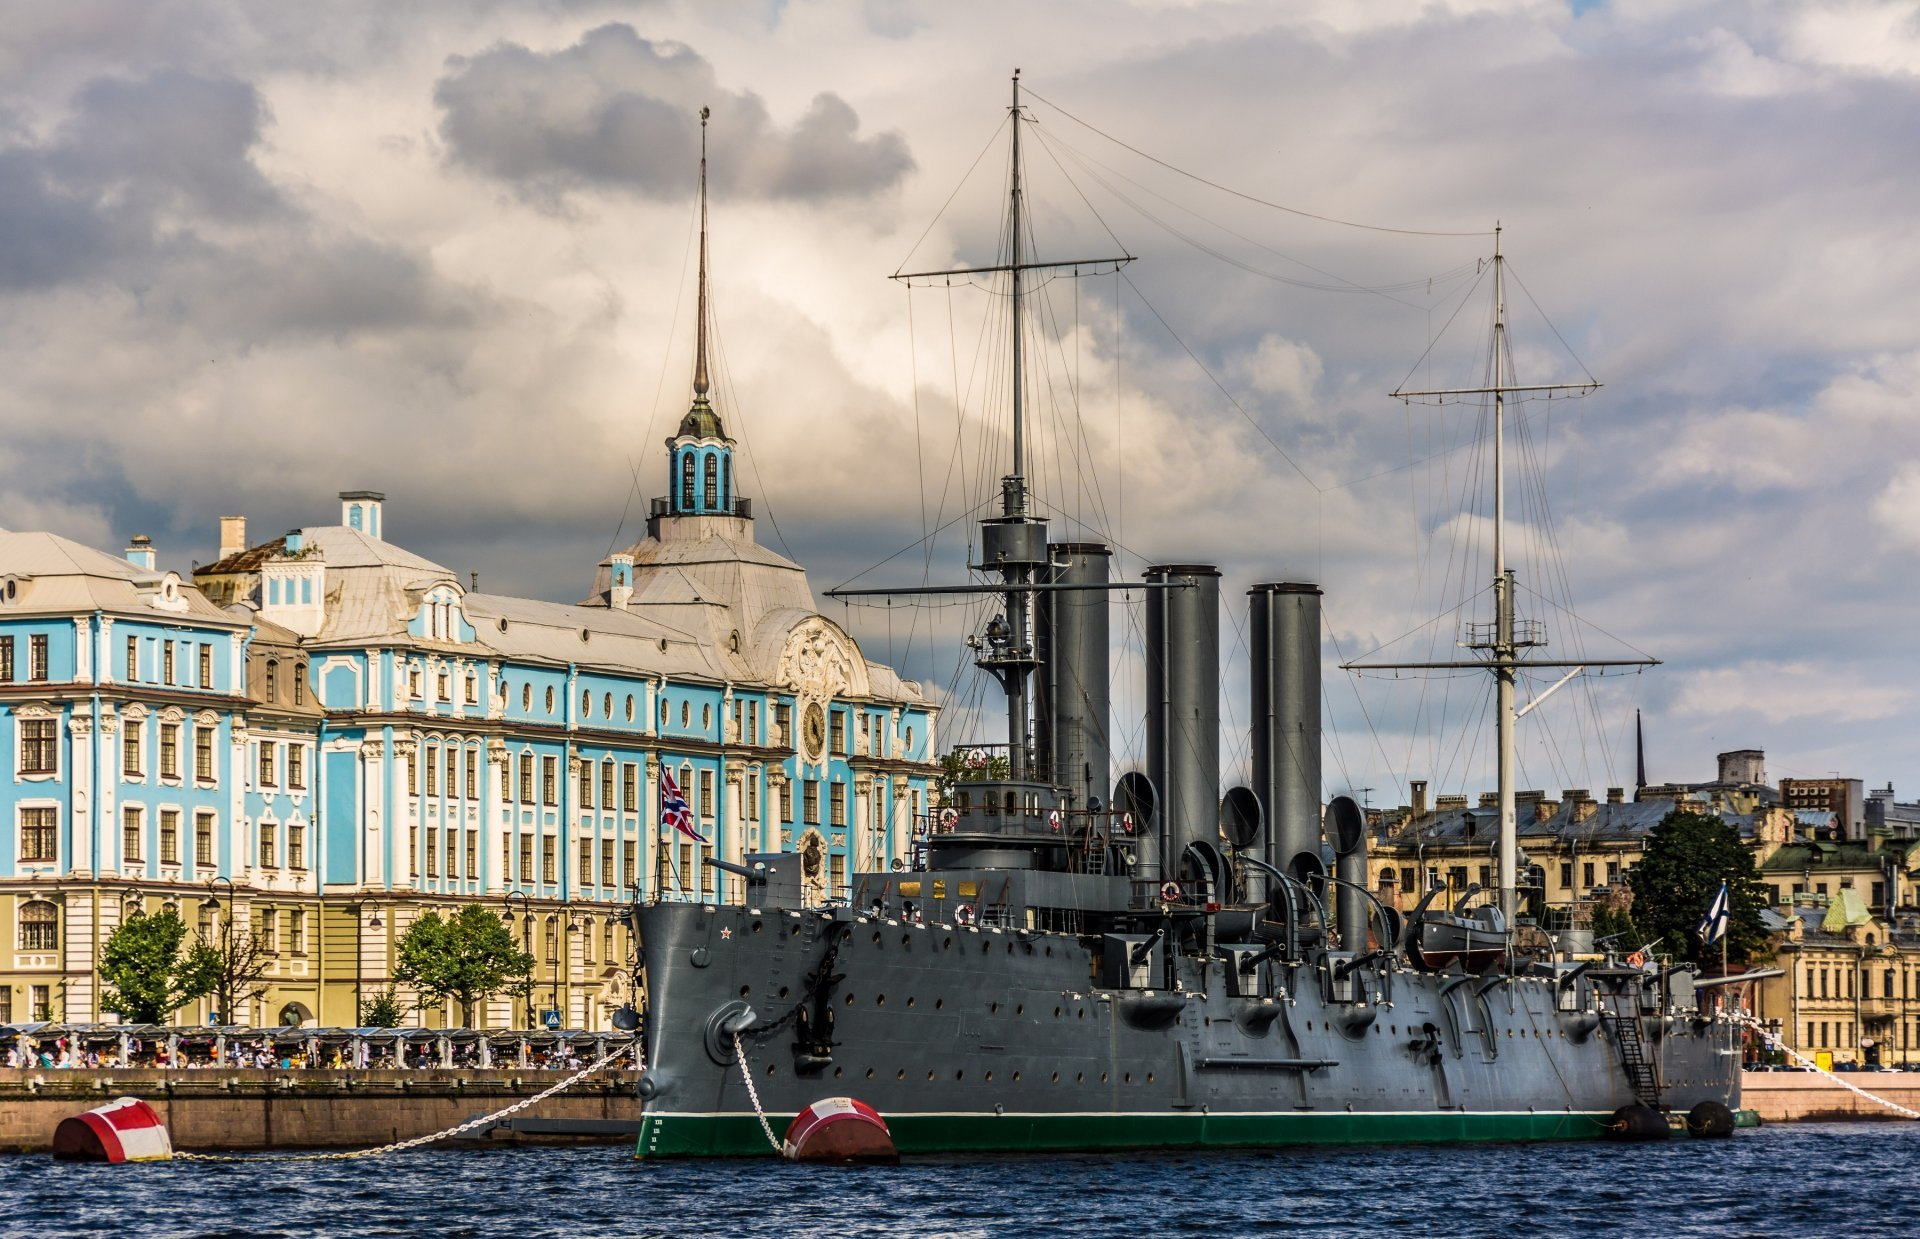 Avrora Ship